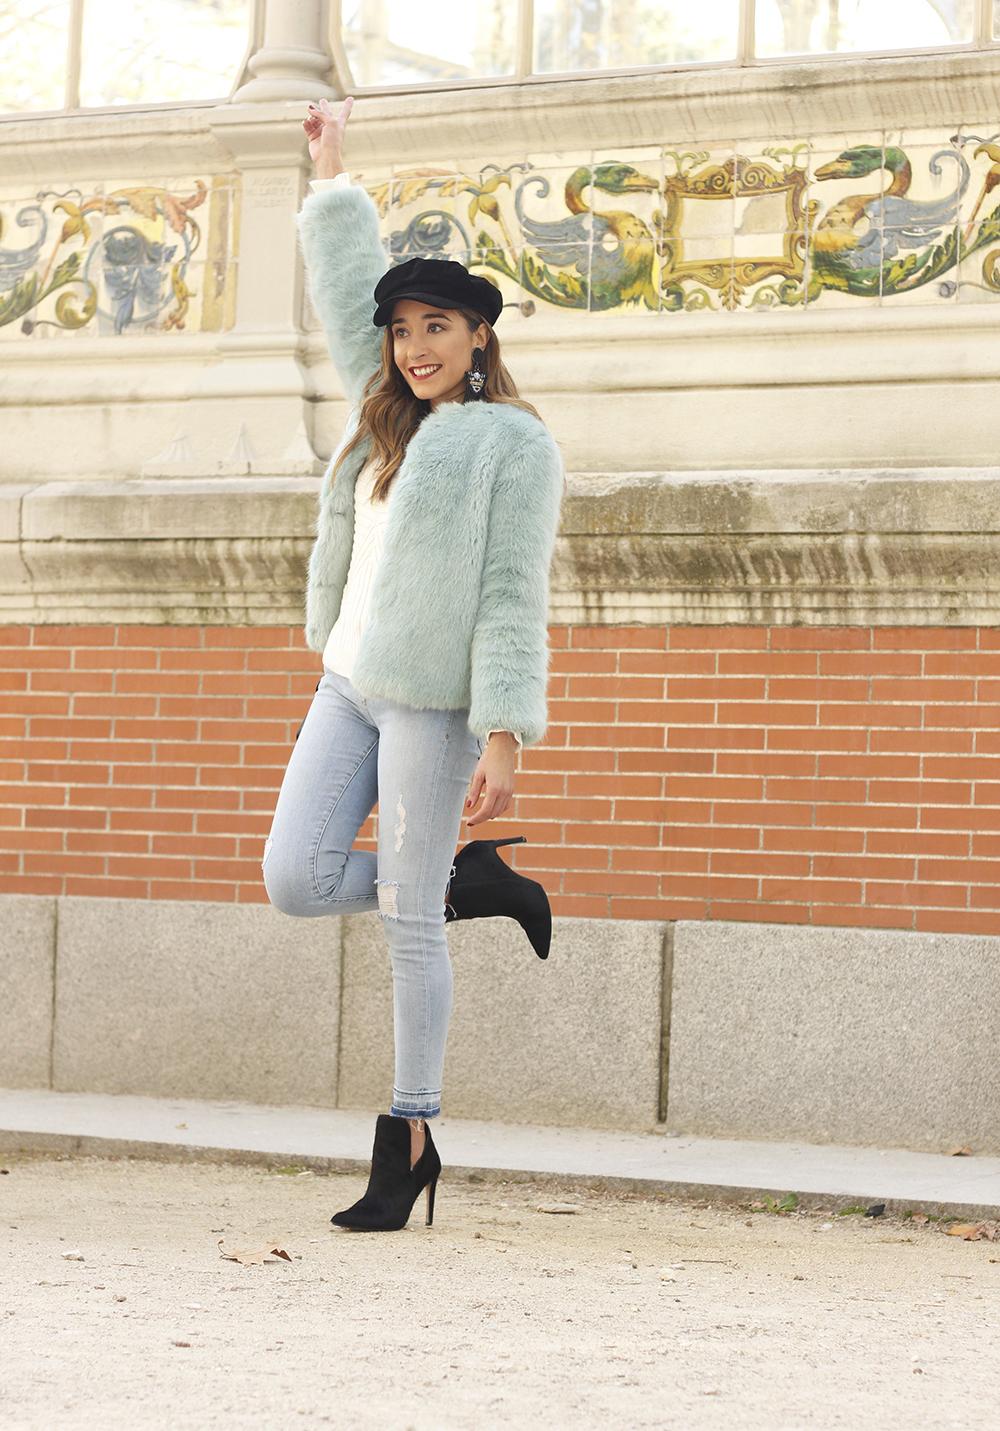 blue light faux fur coat navy cap ripped jeans zara tiger uterqüe earrings outfit street style03